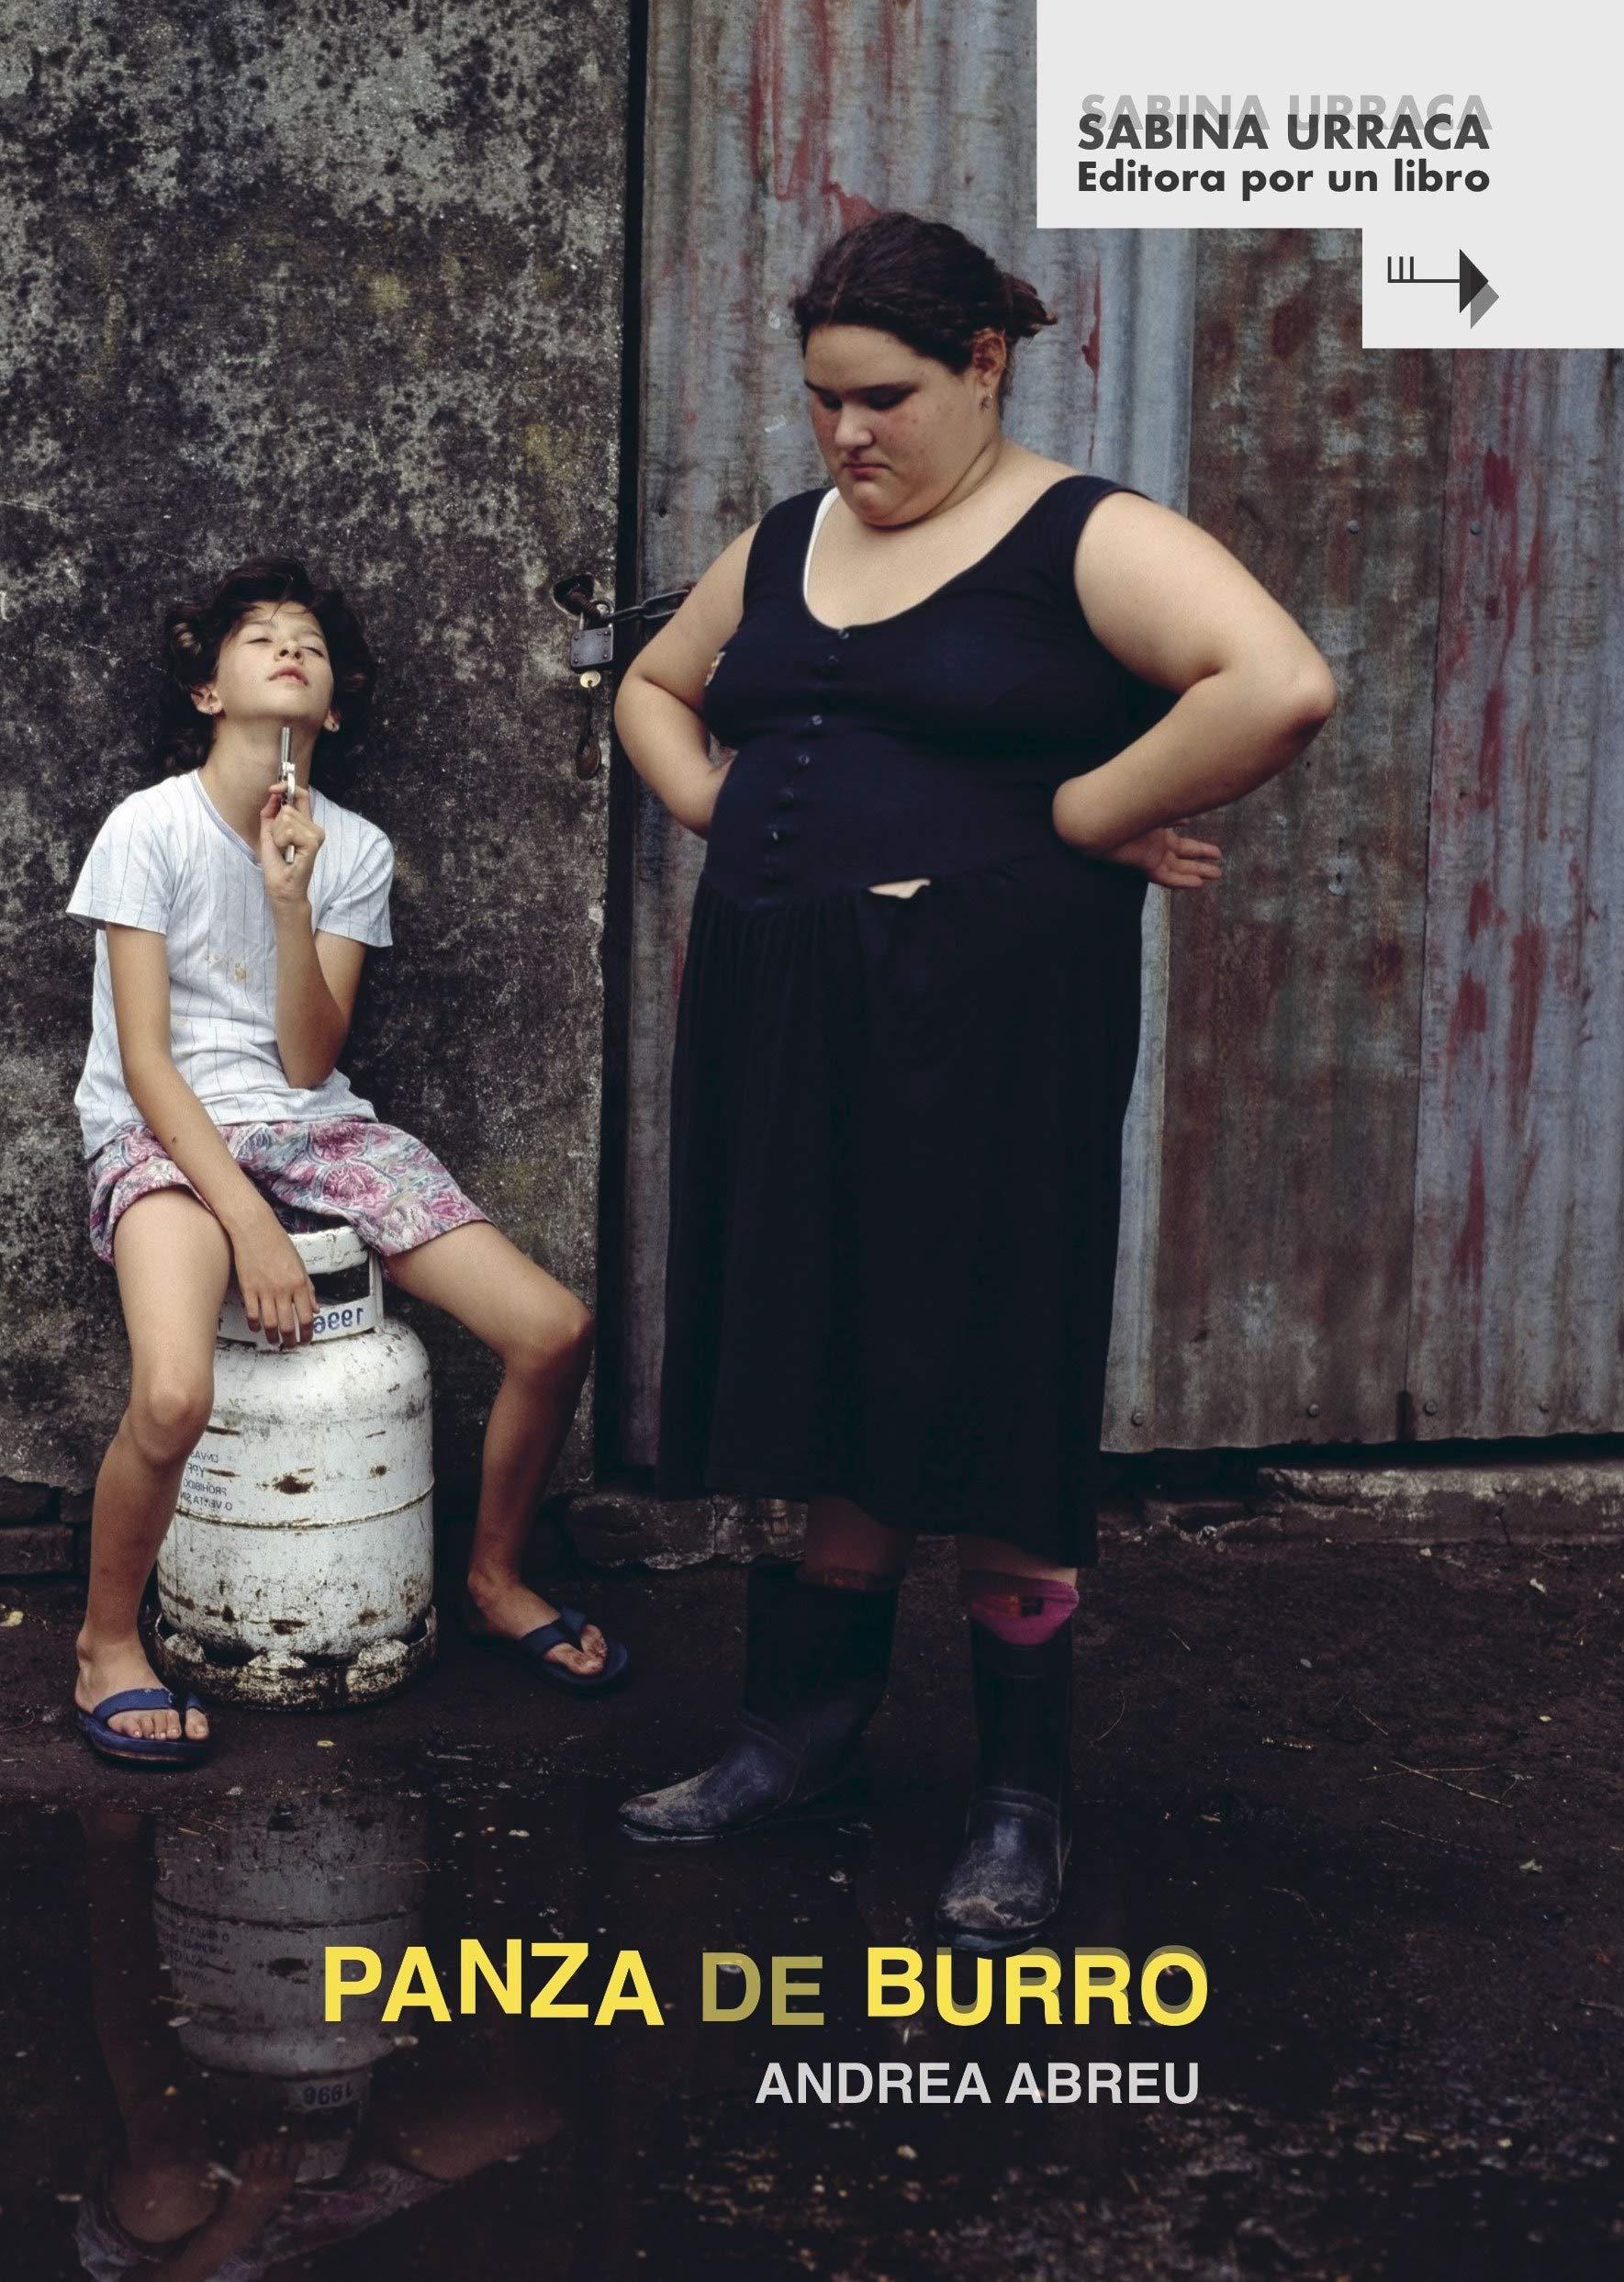 Panza de burro, Andrea Abreu (editado por Sabina Urraca)